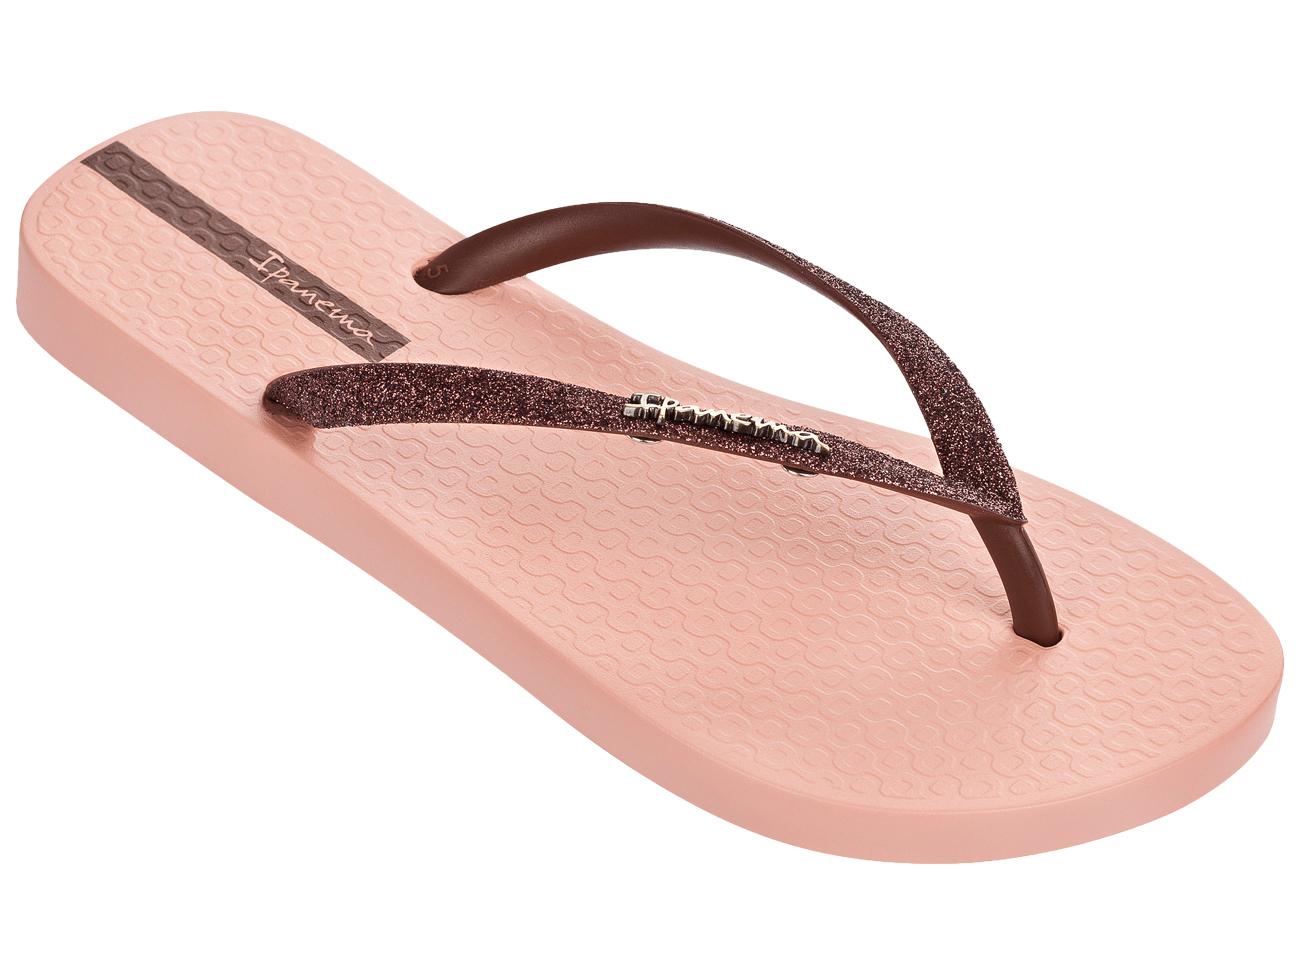 aebb5ce53775f9 NEW Ipanema Sparkle Glitter Flip Flops Sandals Beach Gold Black EU36-41  UK3-8